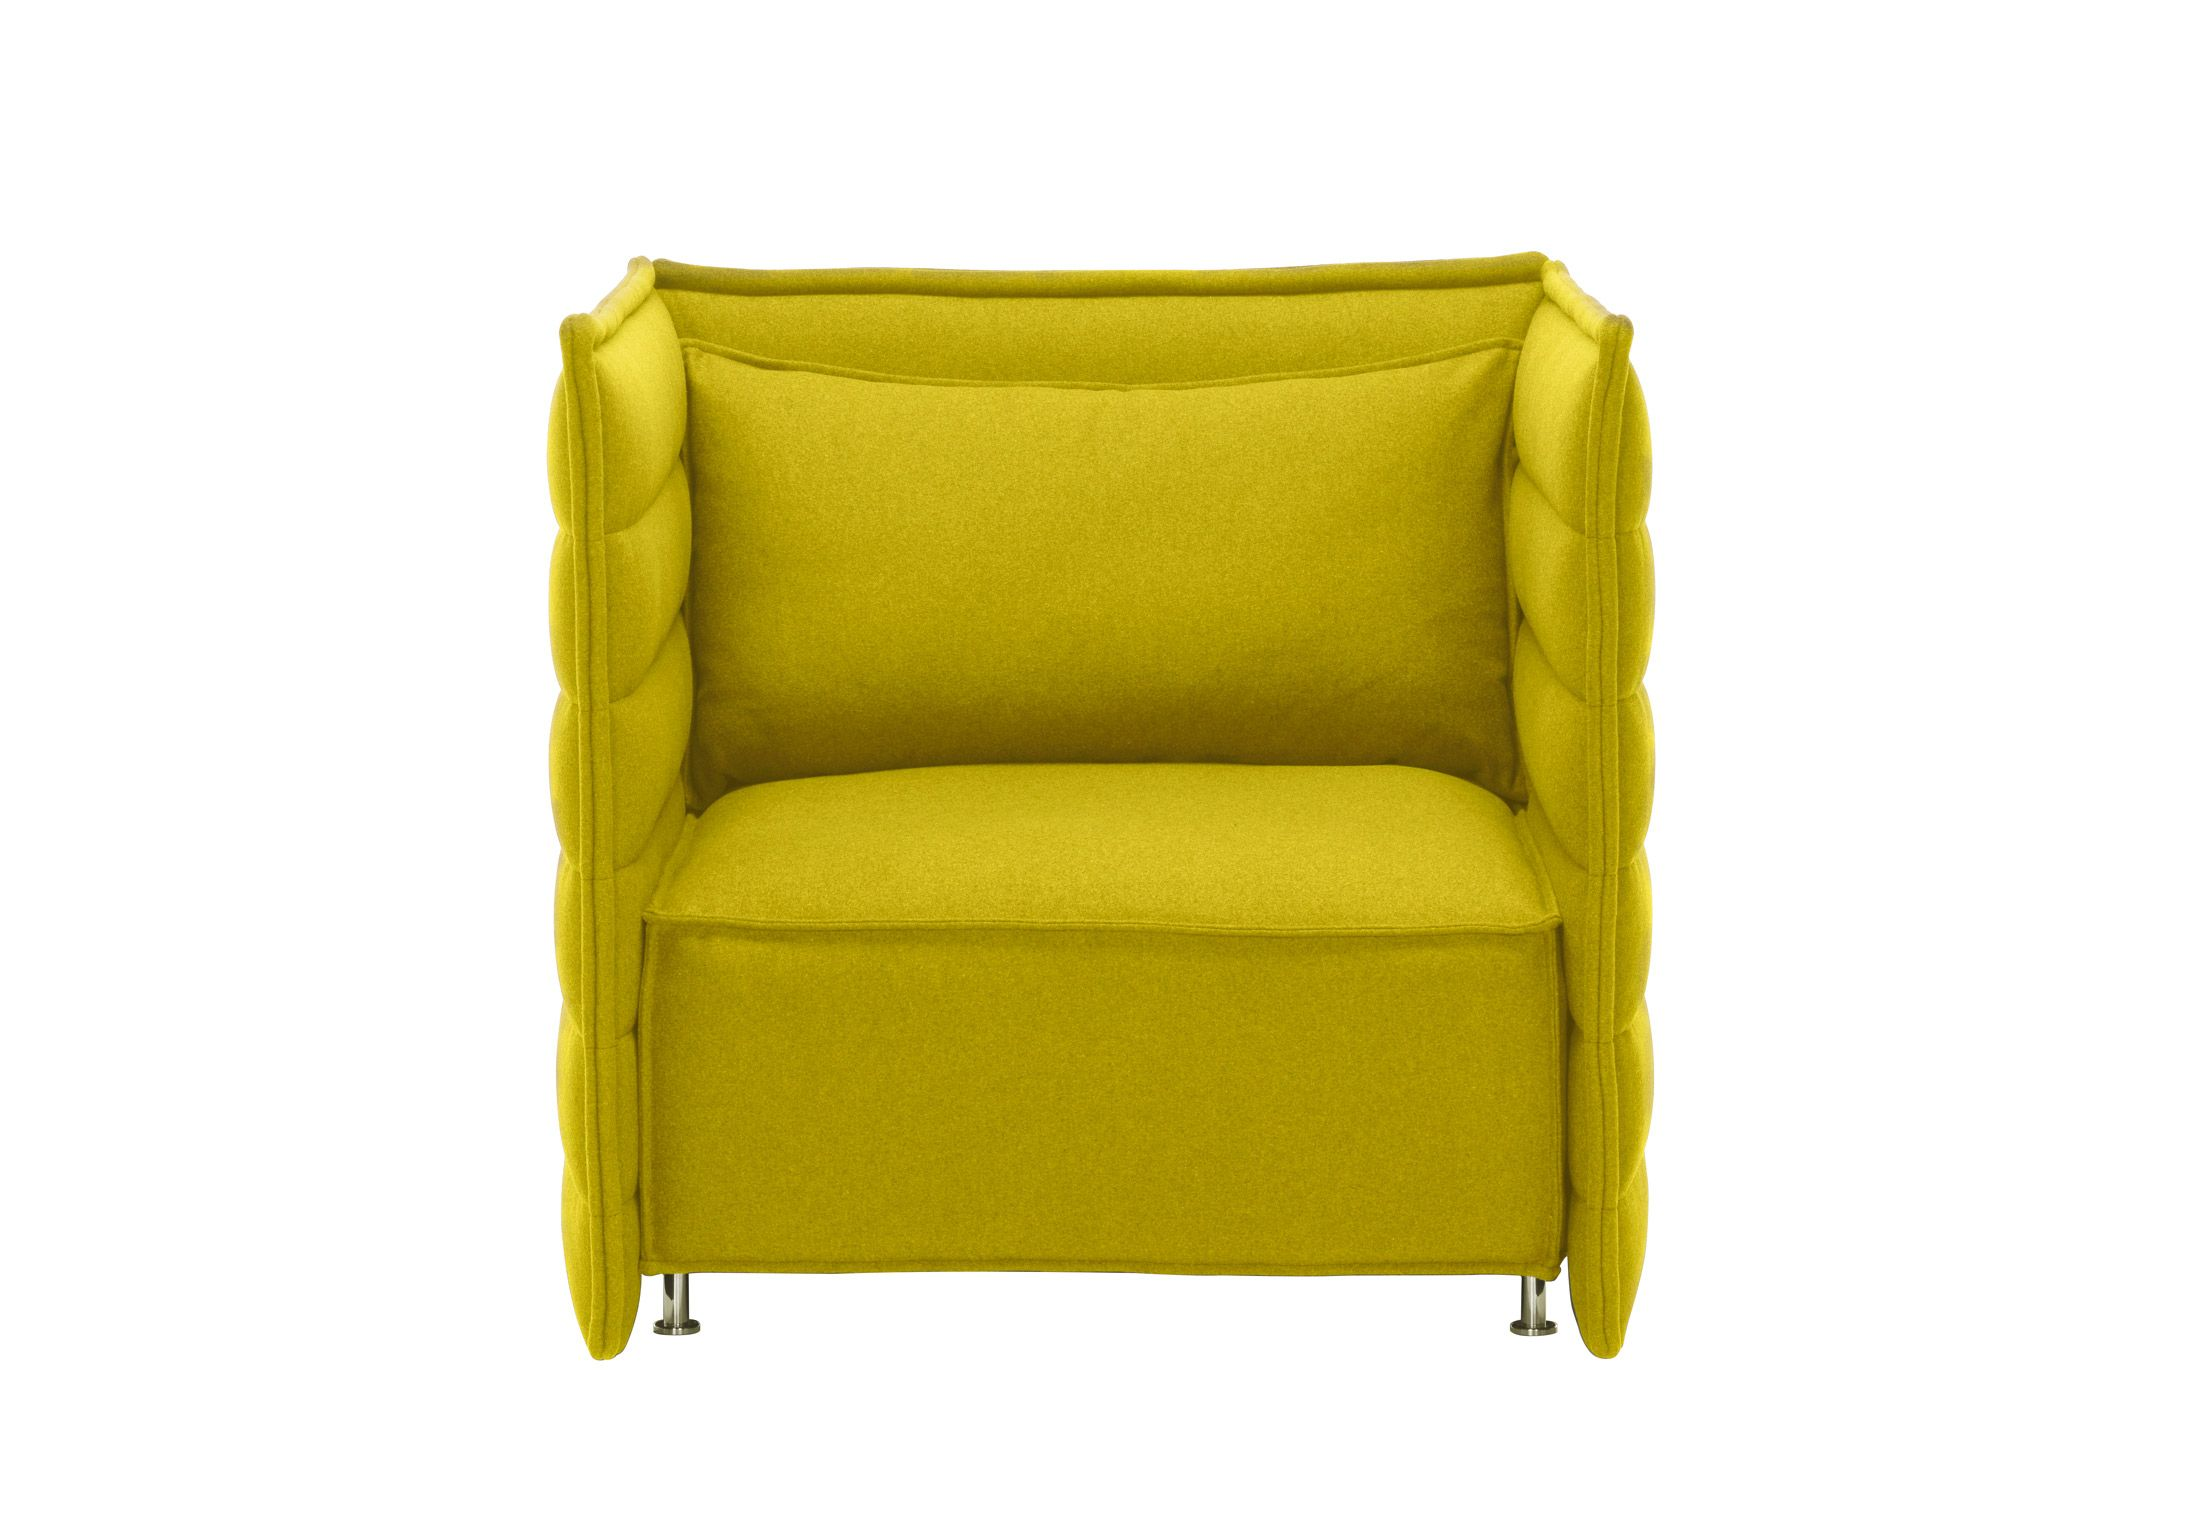 Vitra Alcove Plume armchair Design: Erwan Bouroullec, Ronan Bouroullec